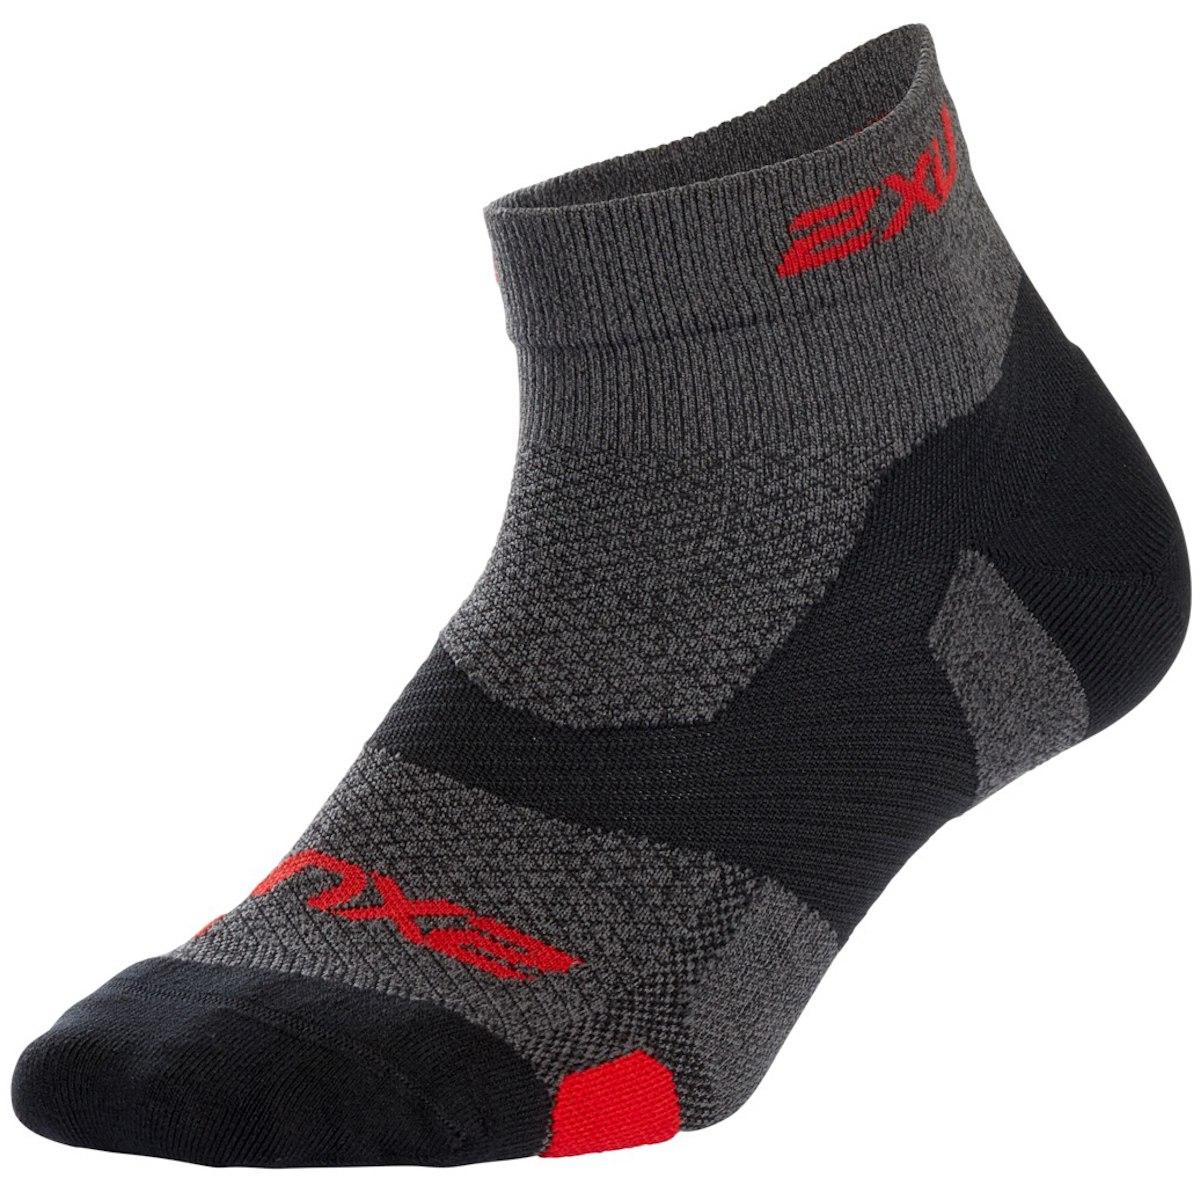 2XU Vectr Light Cushion 1/4 Crew Socks - black print/jungle red